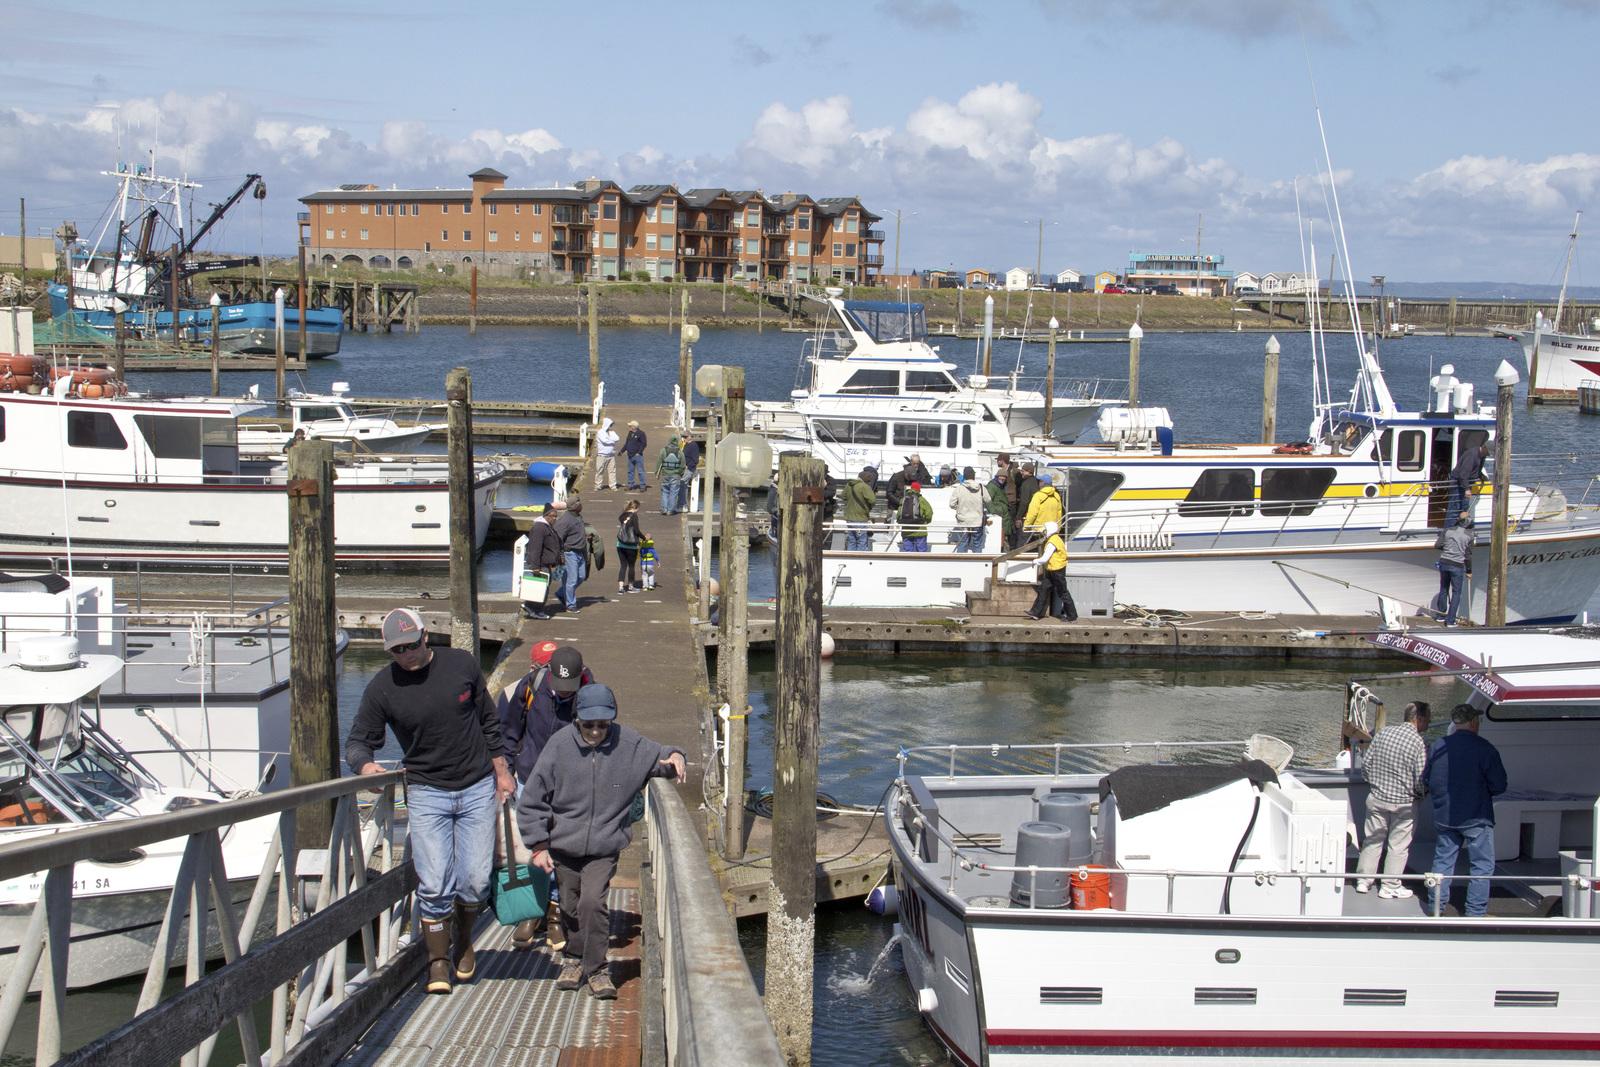 A busy dock in Westport,Grays Harbor County. Photo by Joel Rogers.